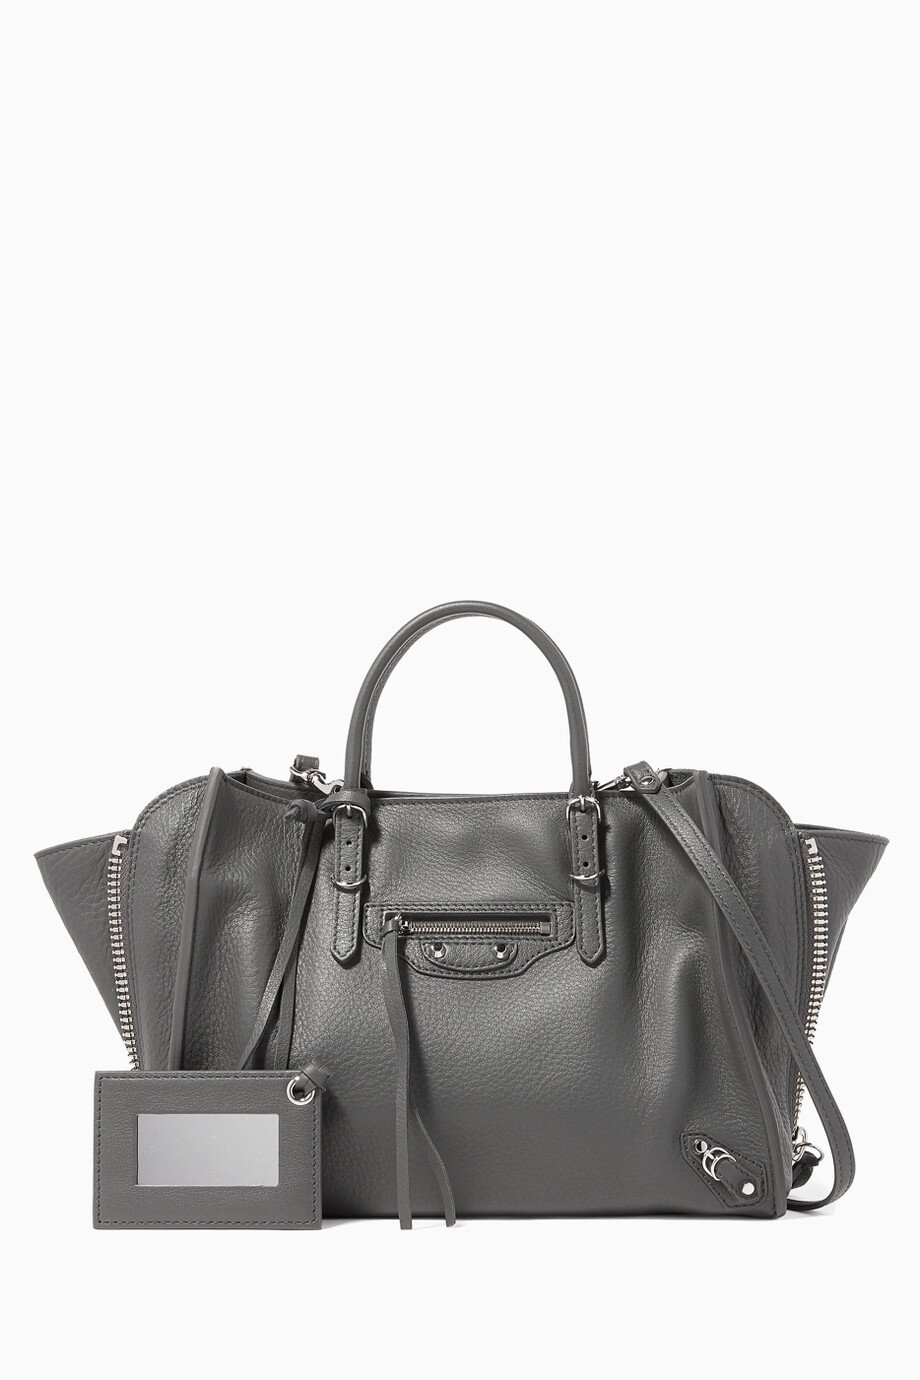 82c1f0a09069 Shop Balenciaga Grey Grey Papier A6 Side-Zip Shoulder Bag for Women ...